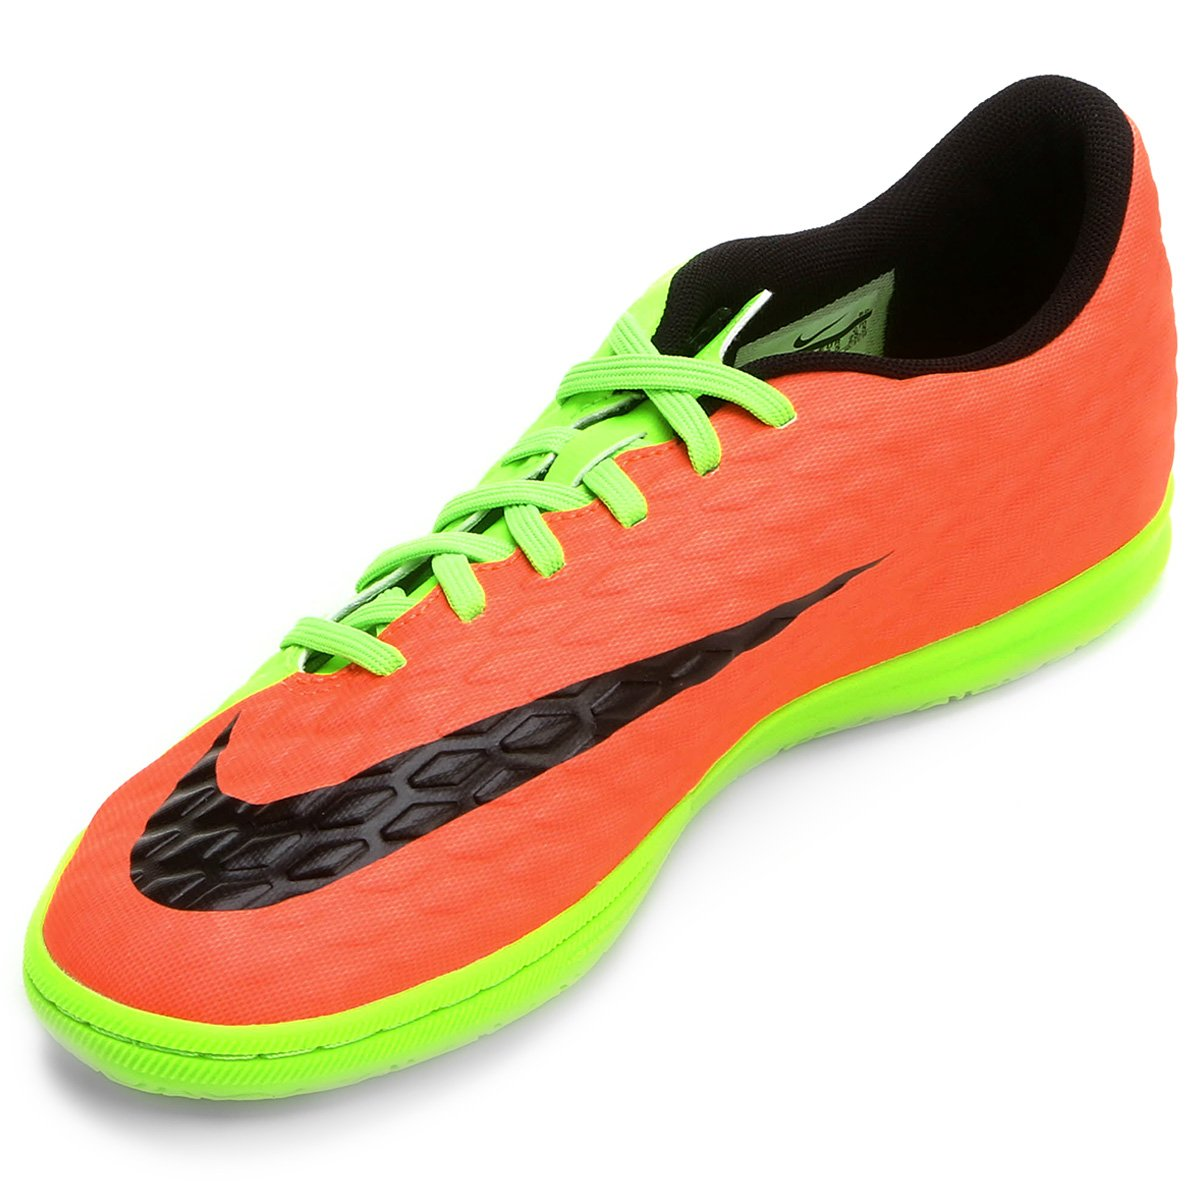 a7a1cd69c4 Chuteira Futsal Nike Hypervenom Phade 3 IC - Compre Agora